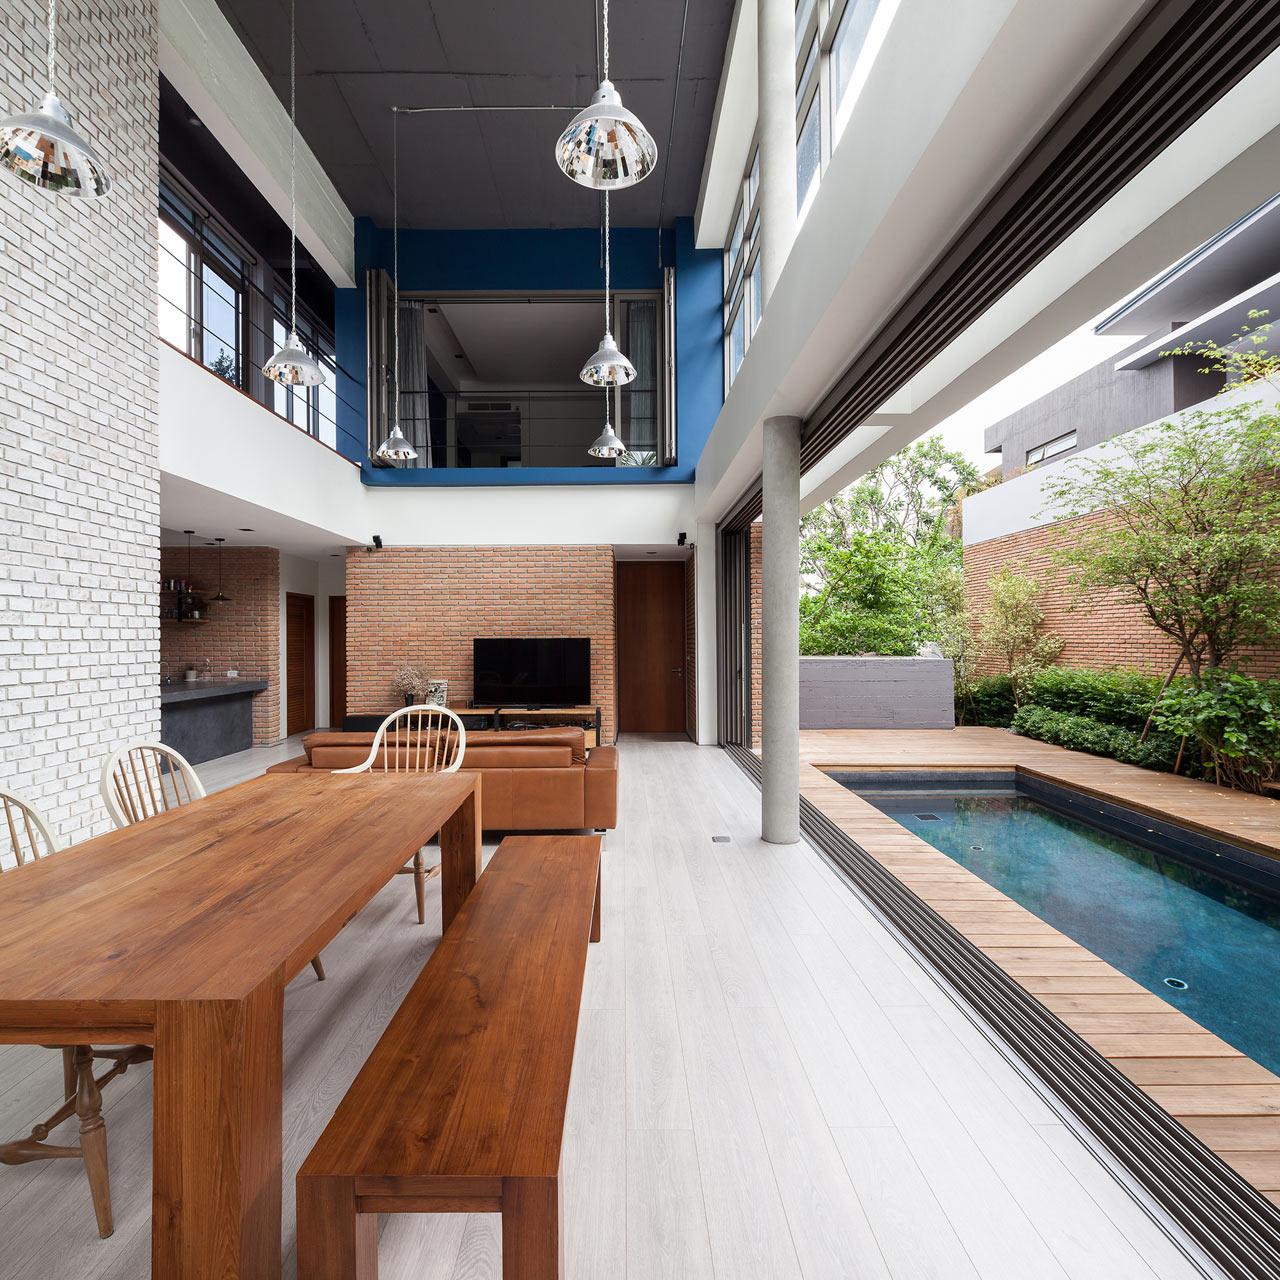 10 Homes Designed for Indoor/Outdoor Living - Design Milk on Outdoor Living Designer  id=90405